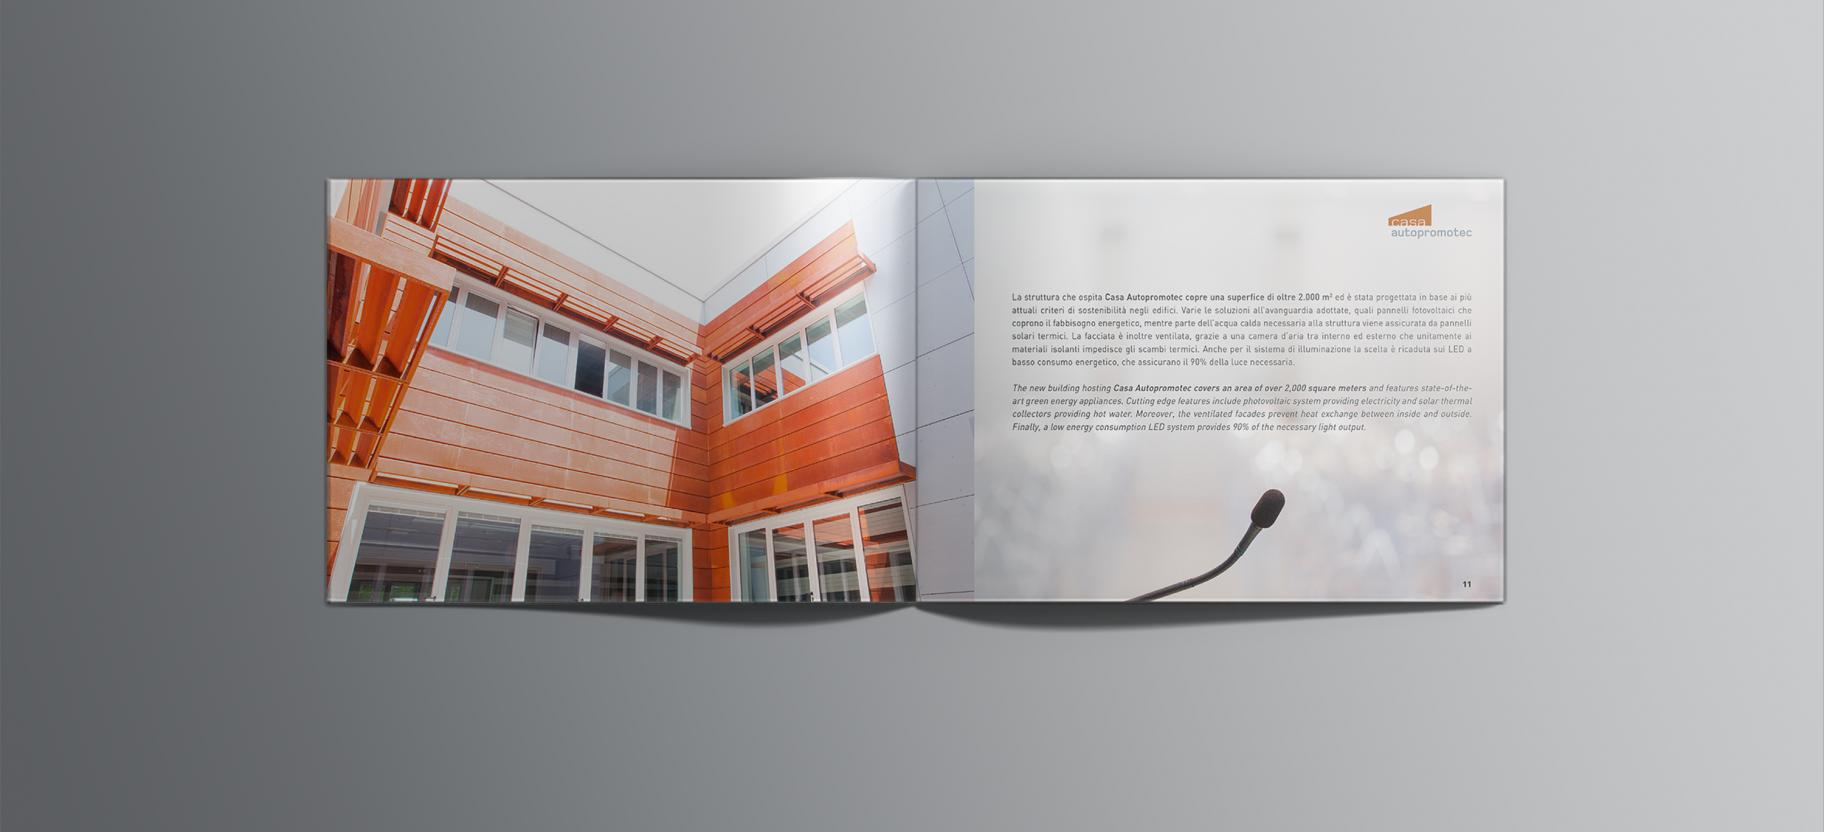 Casa Autopromotec-Brochure-04